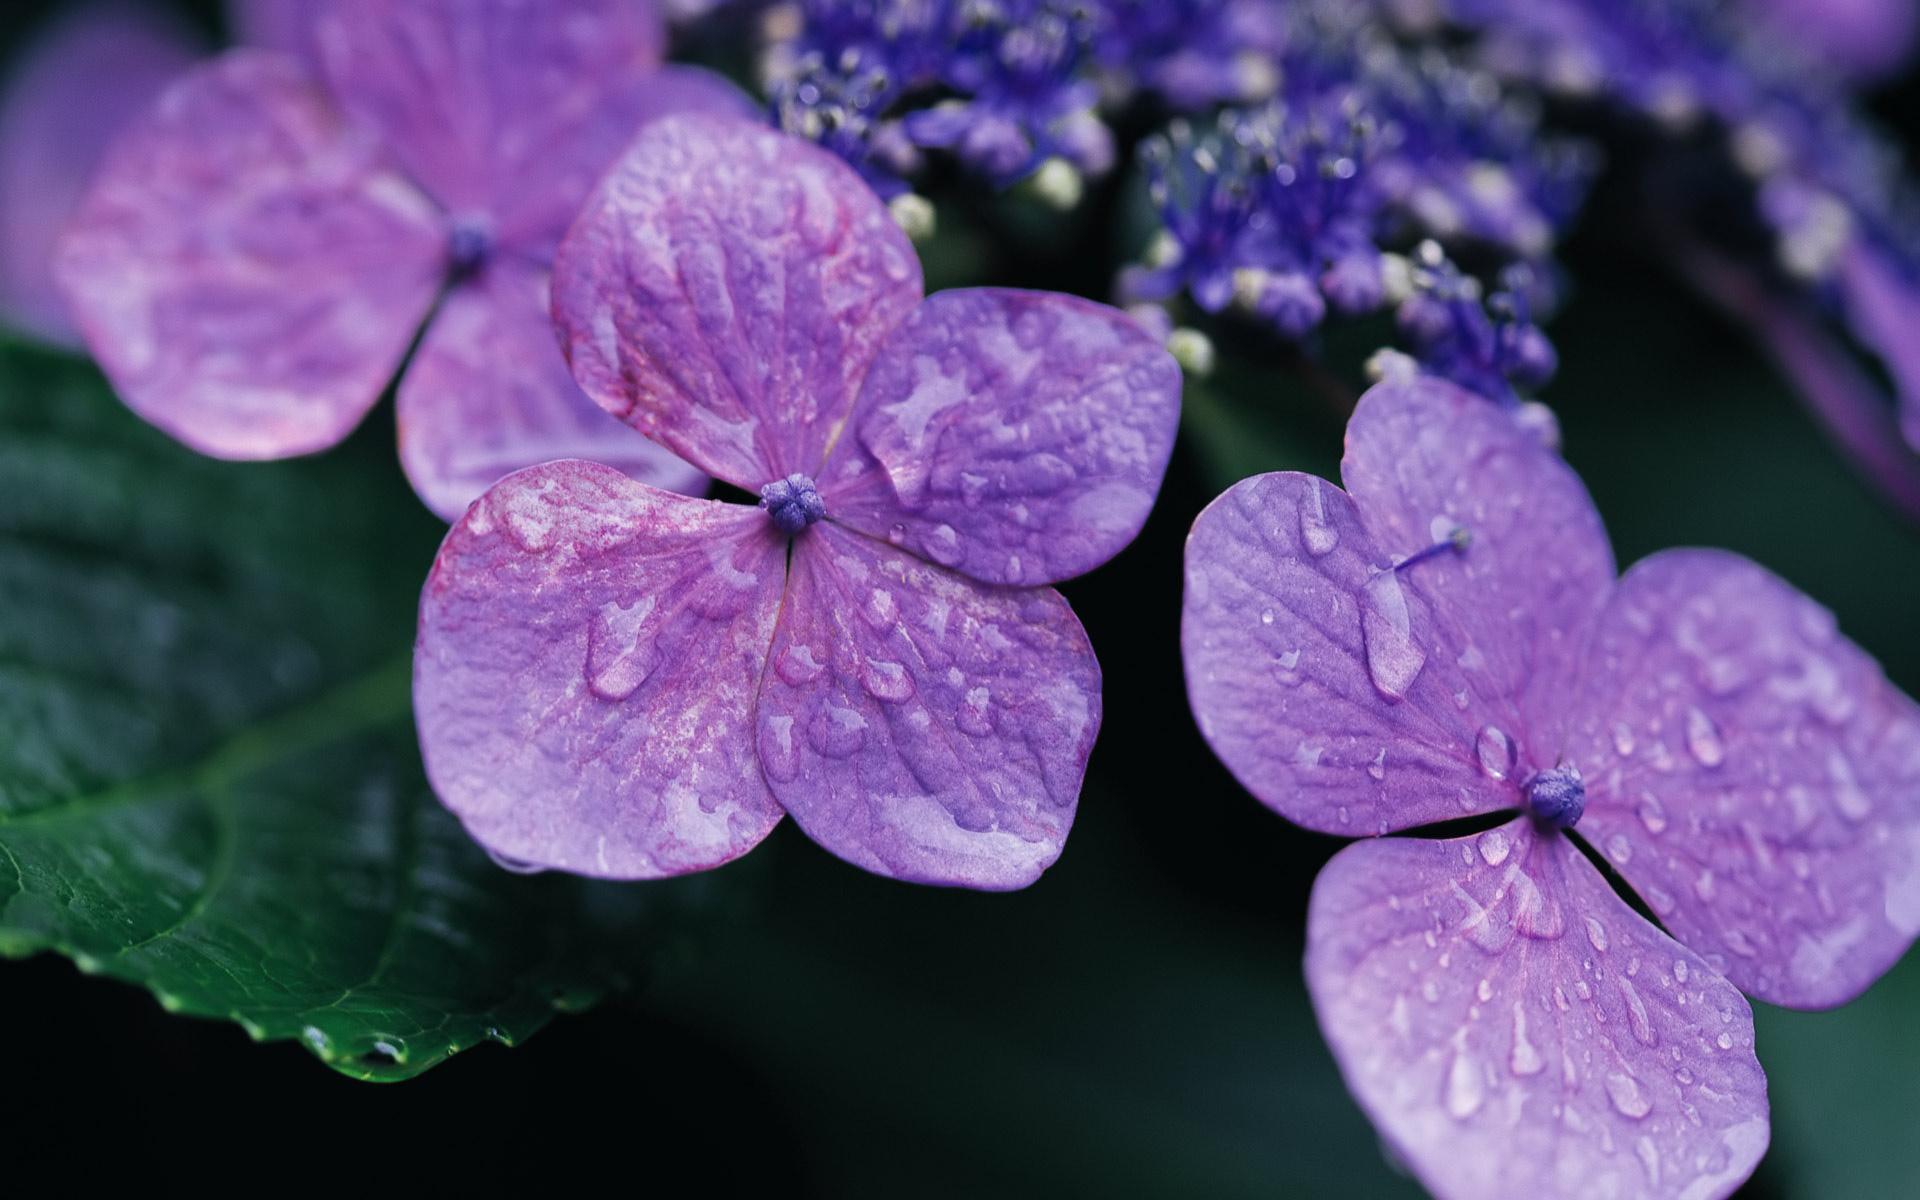 Lilac Backgrounds Hd Desktop Wallpapers 4k Hd